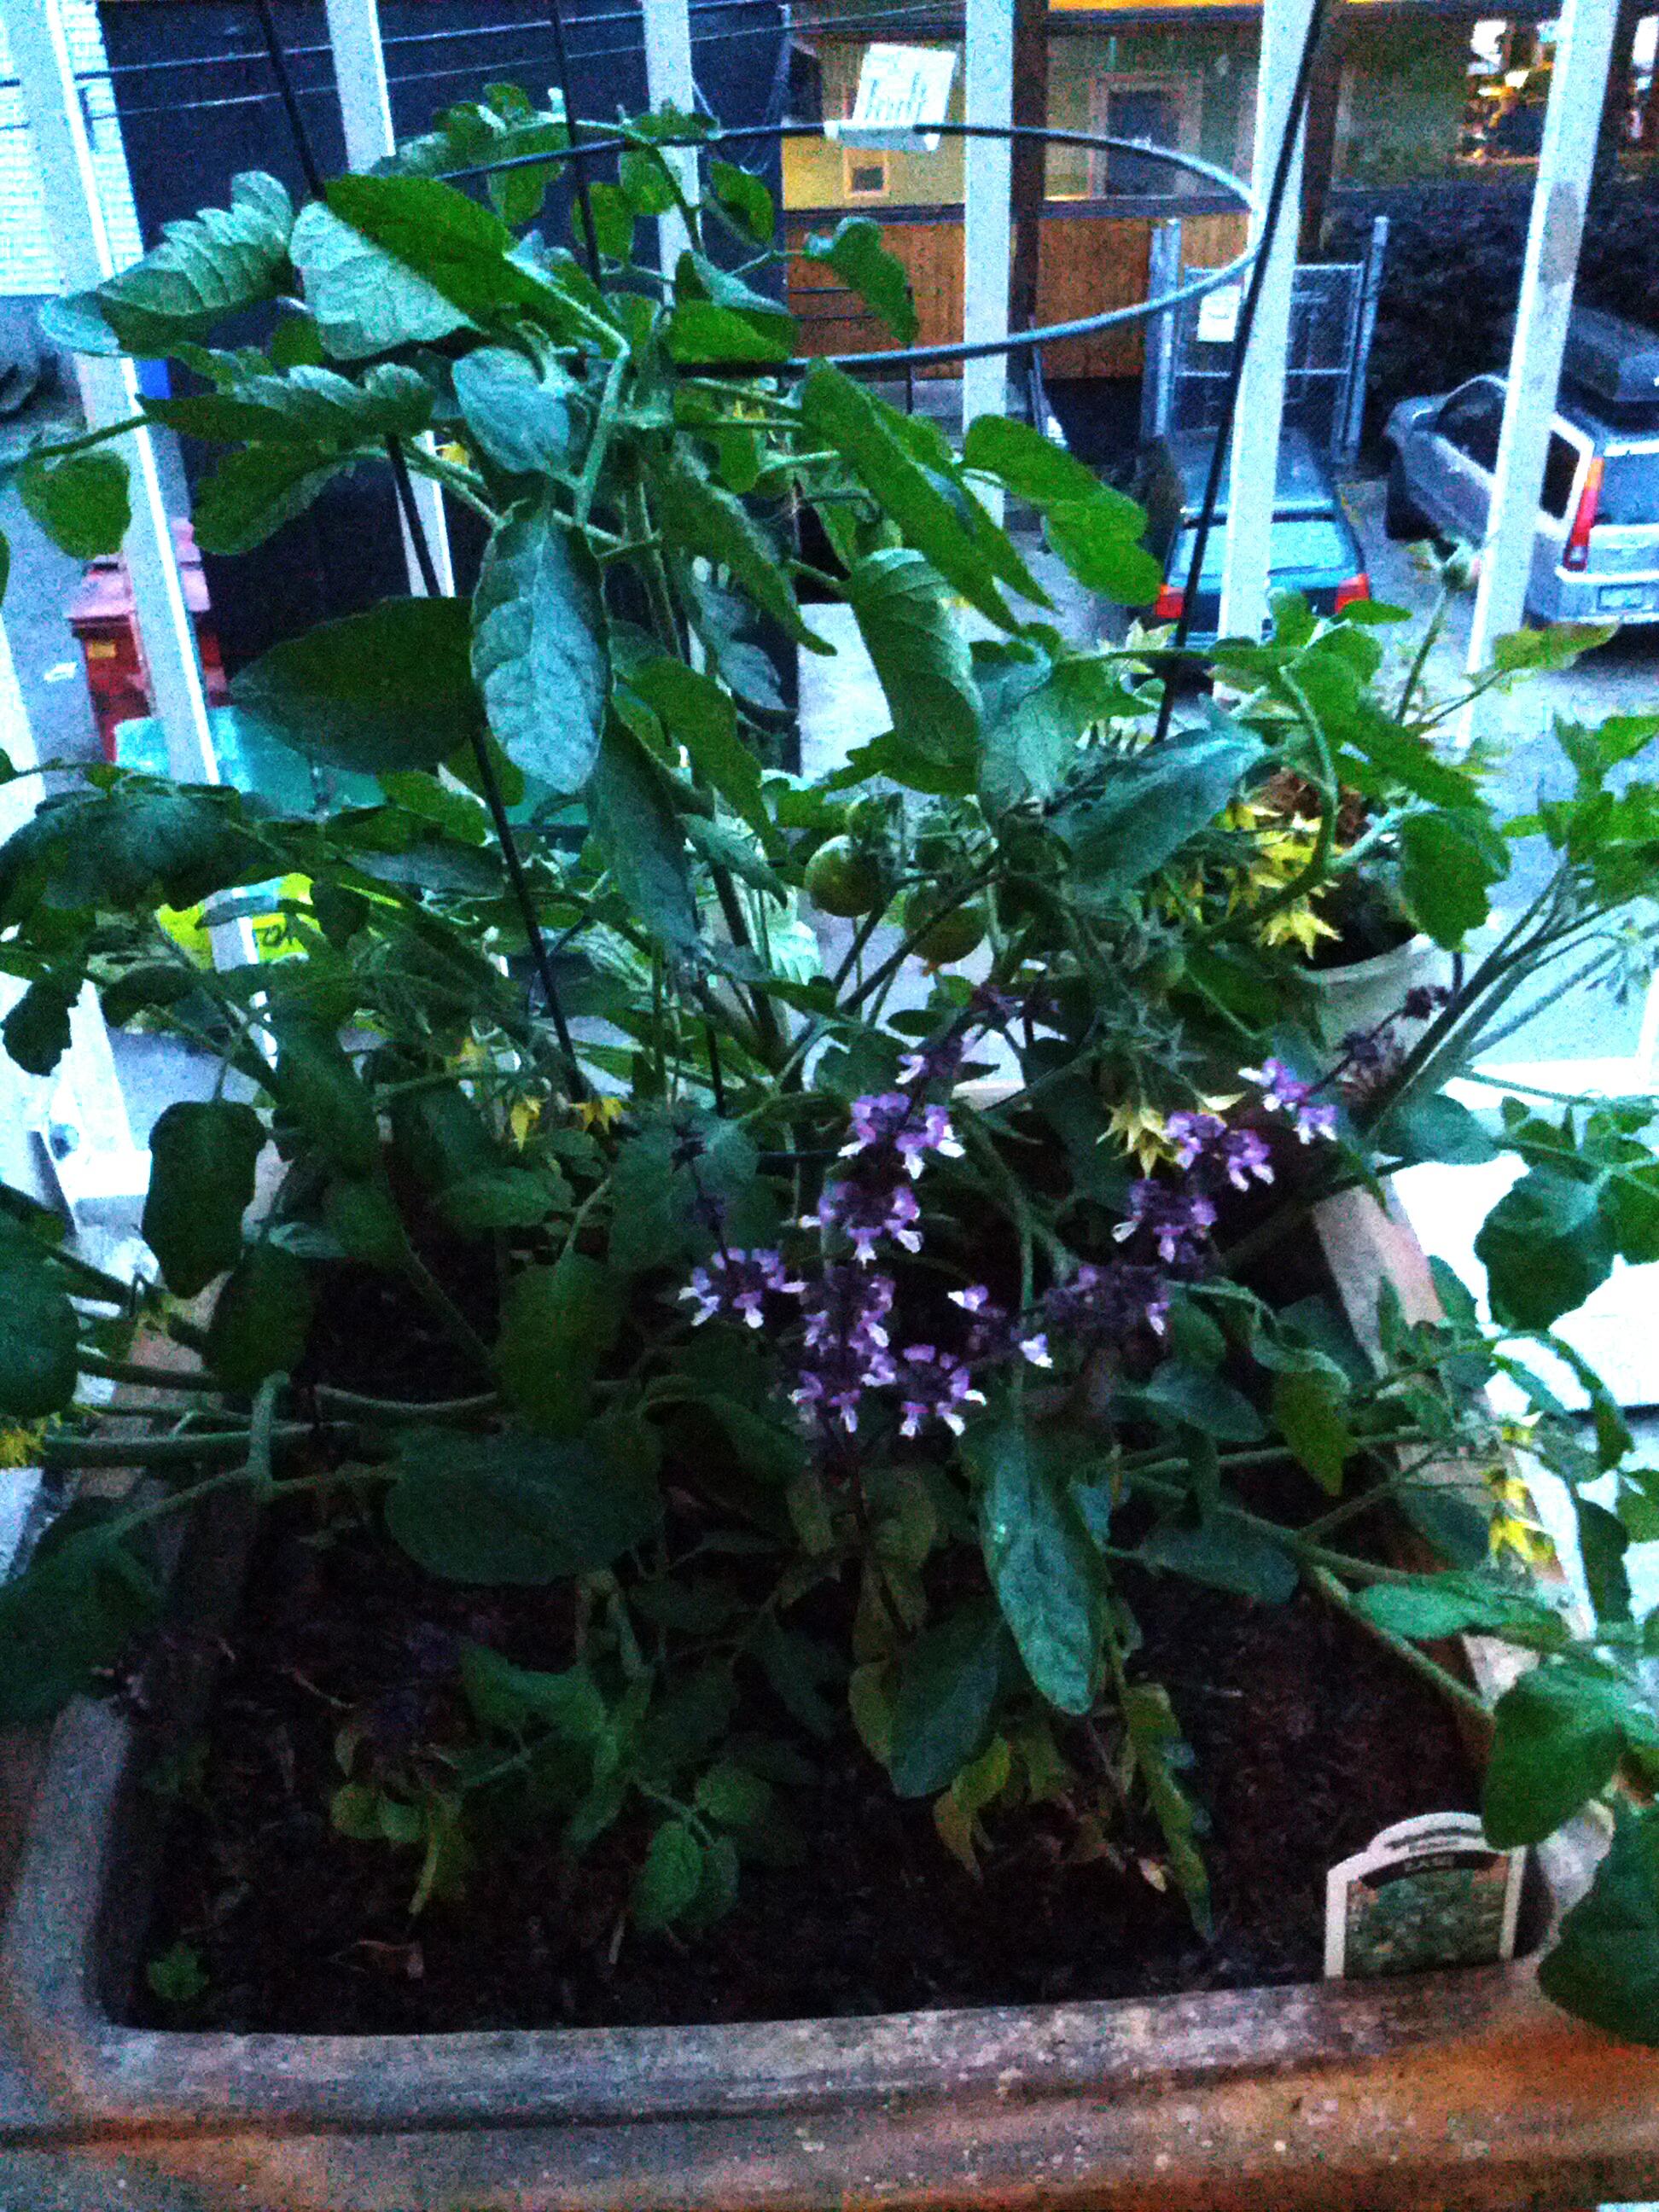 Community Garden, balcony garden, garden update, taking care of plants, tips on growing plants